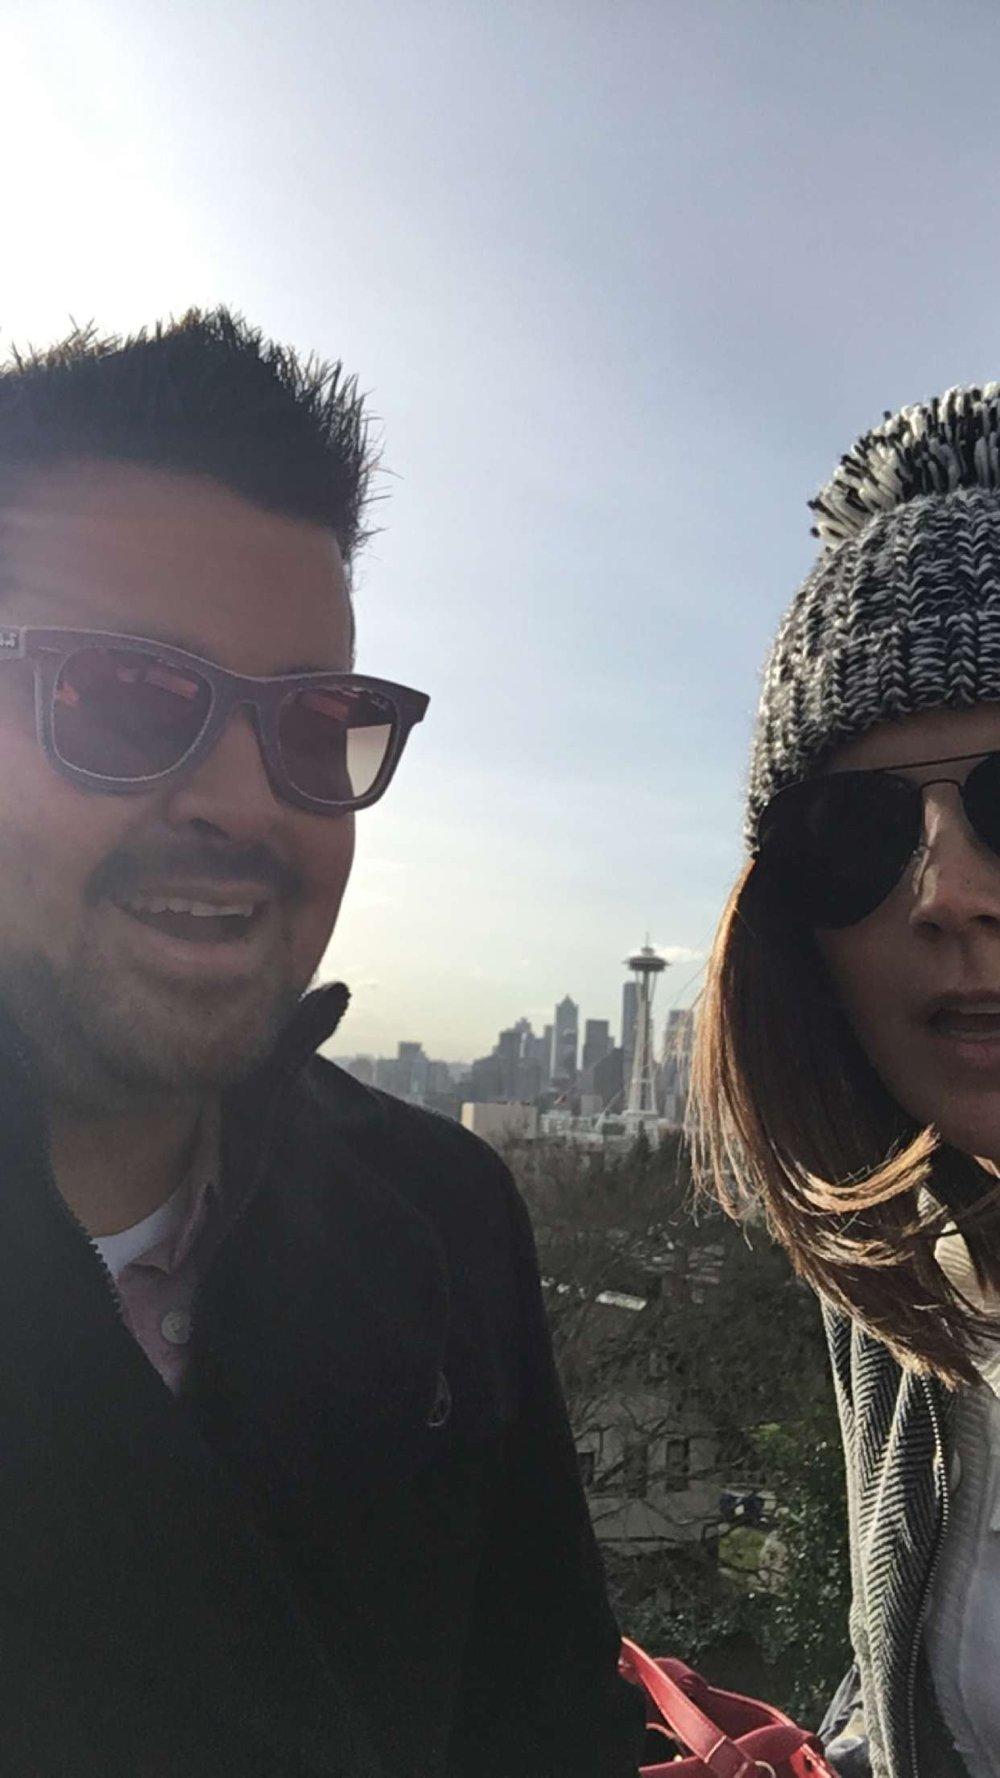 Seattle, Washington w/ my love. December, 2016